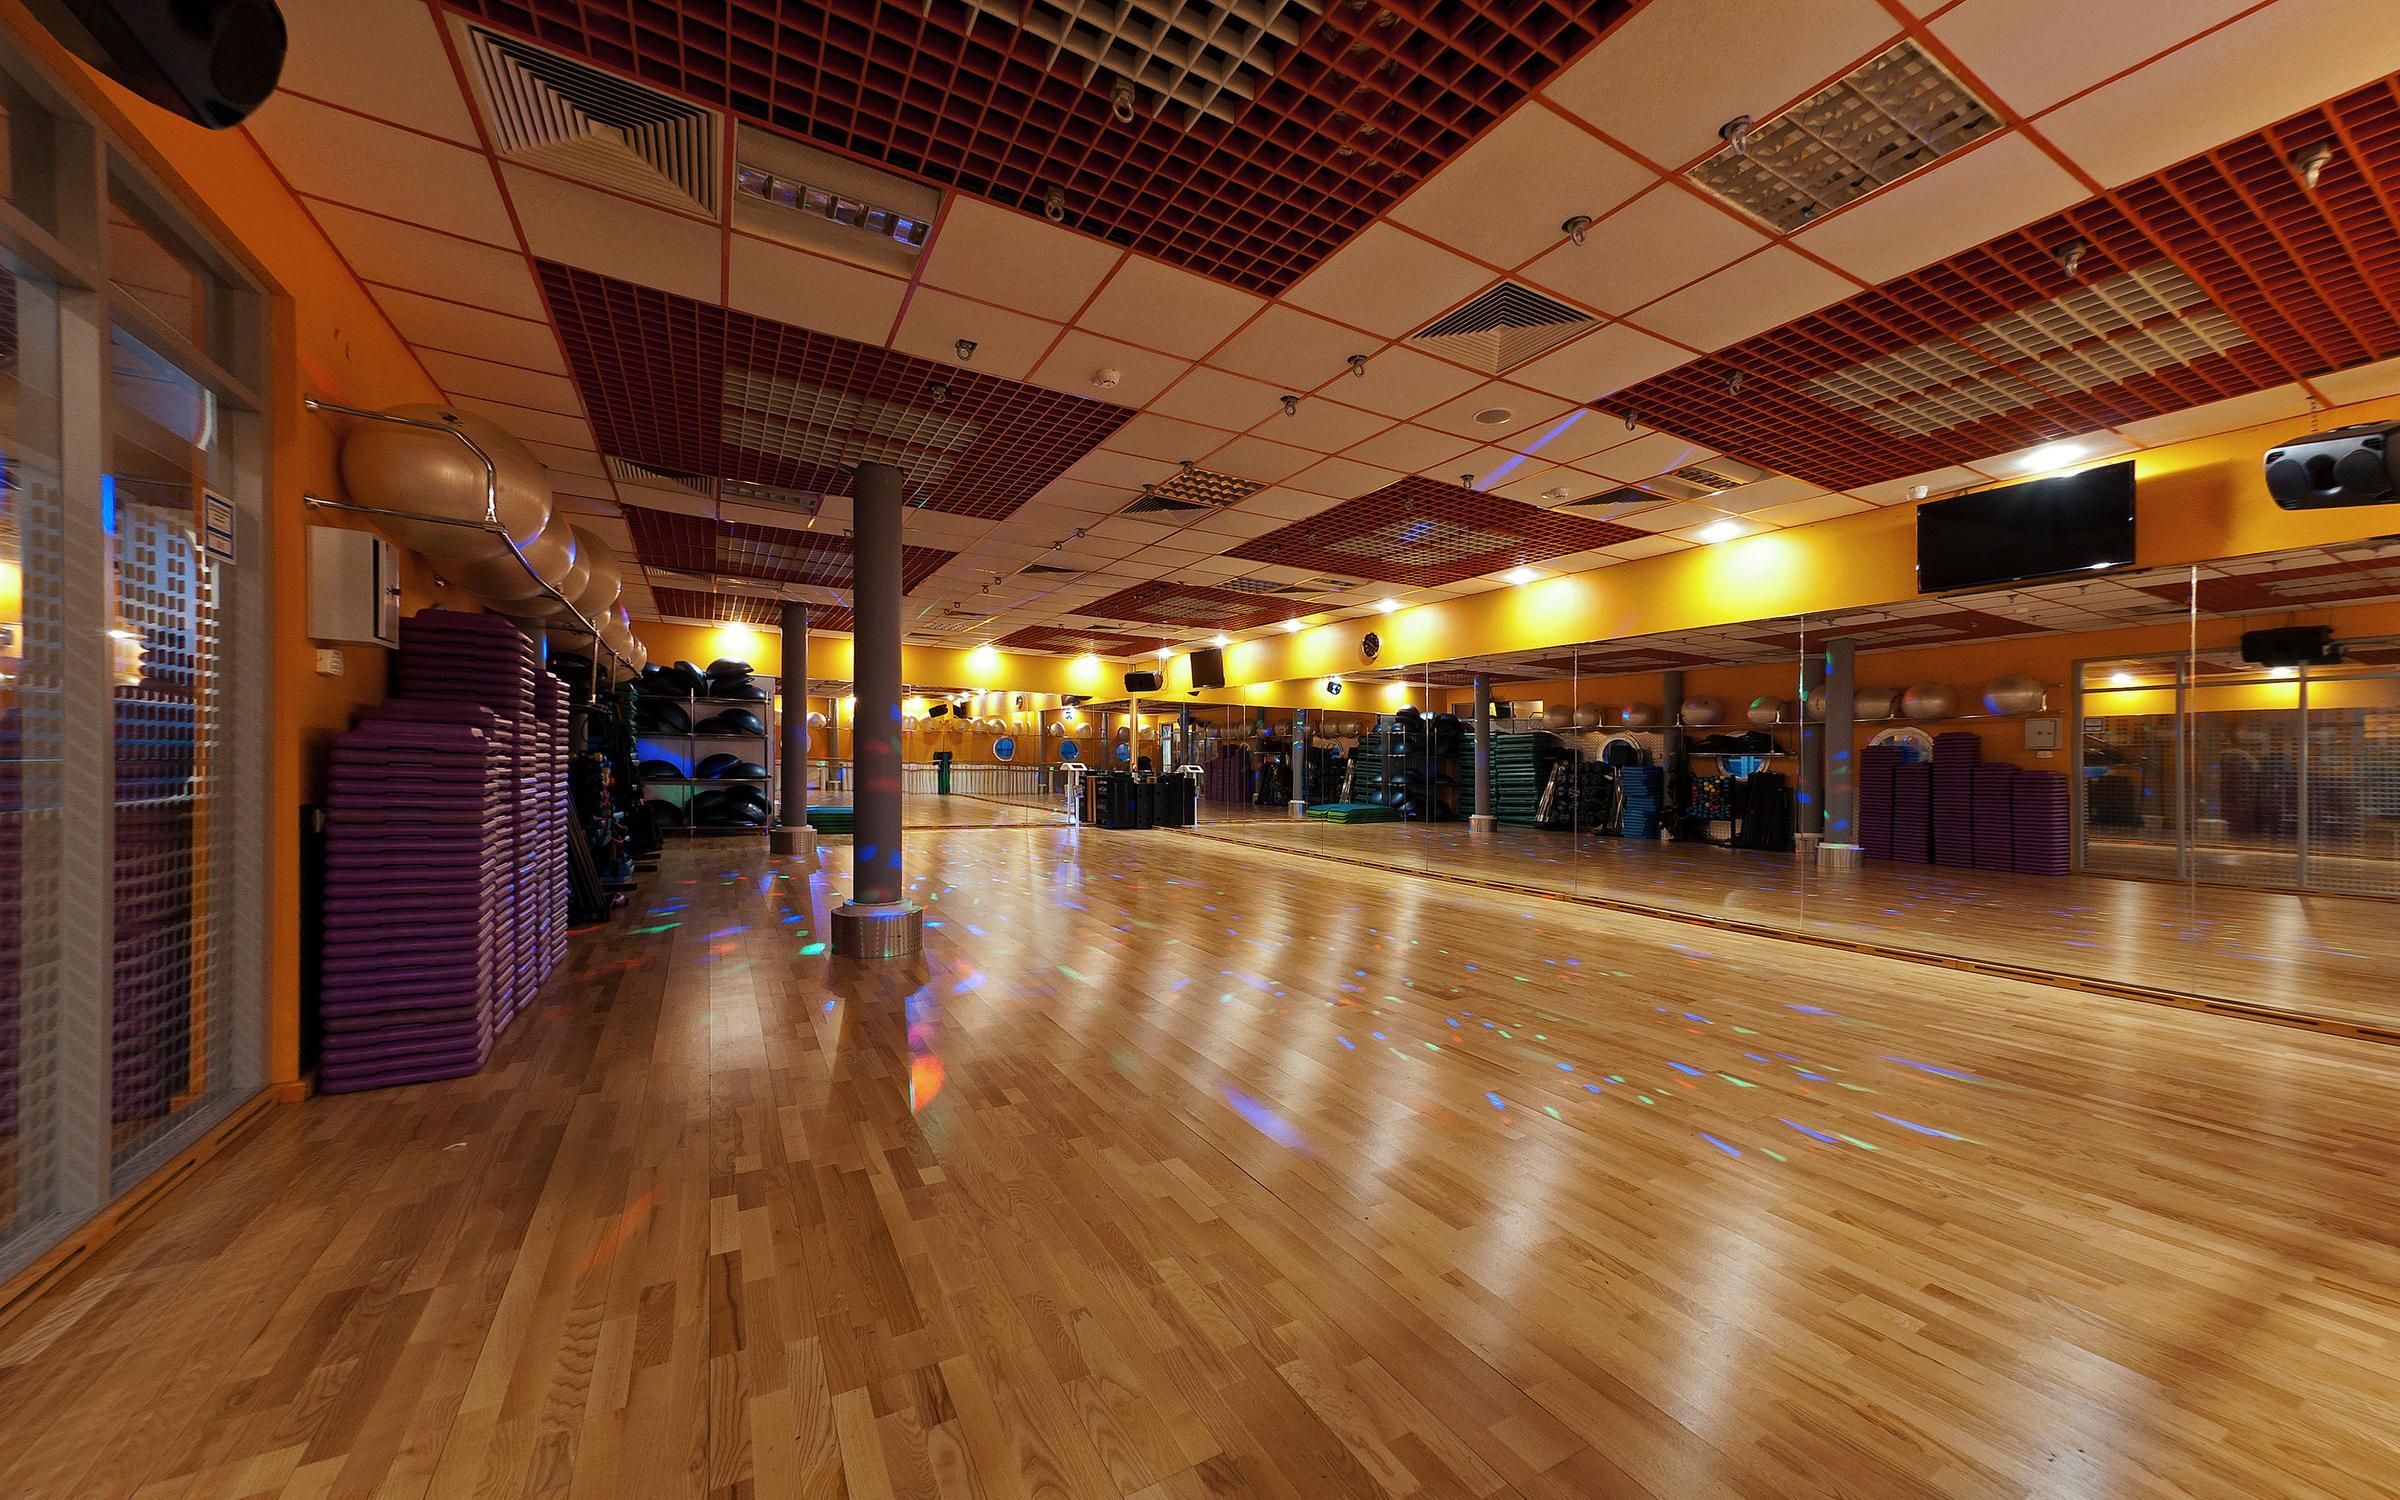 фотография Спортивно-оздоровительного комплекса Janinn Fitness в Строгино